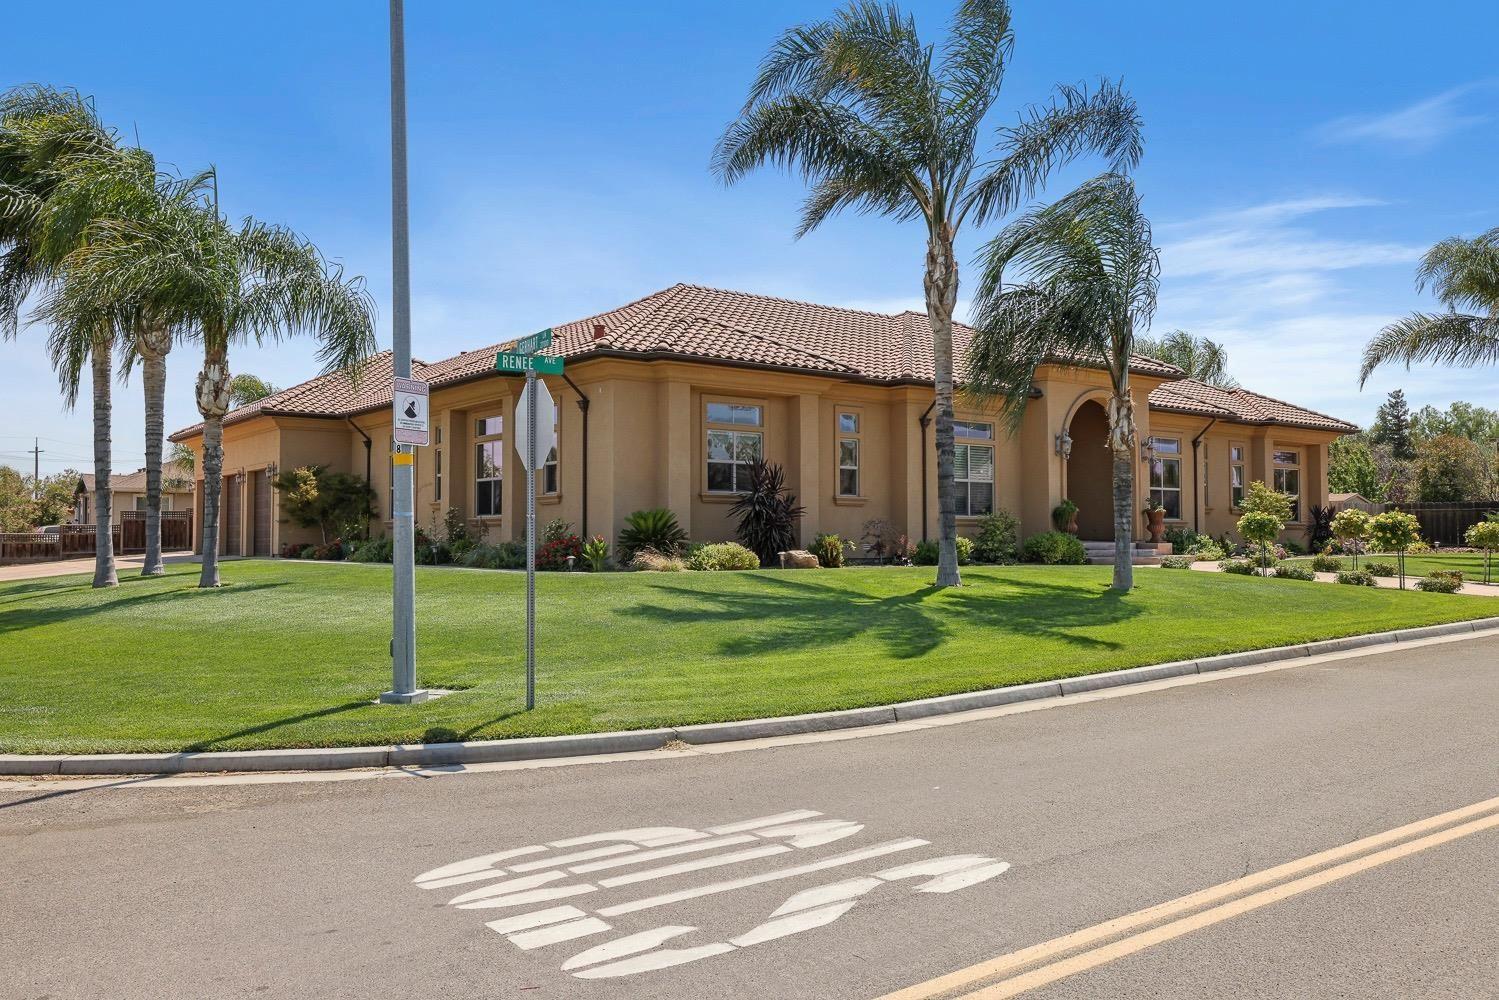 Photo of 7860 Renee Drive, Tracy, CA 95304 (MLS # 221071294)